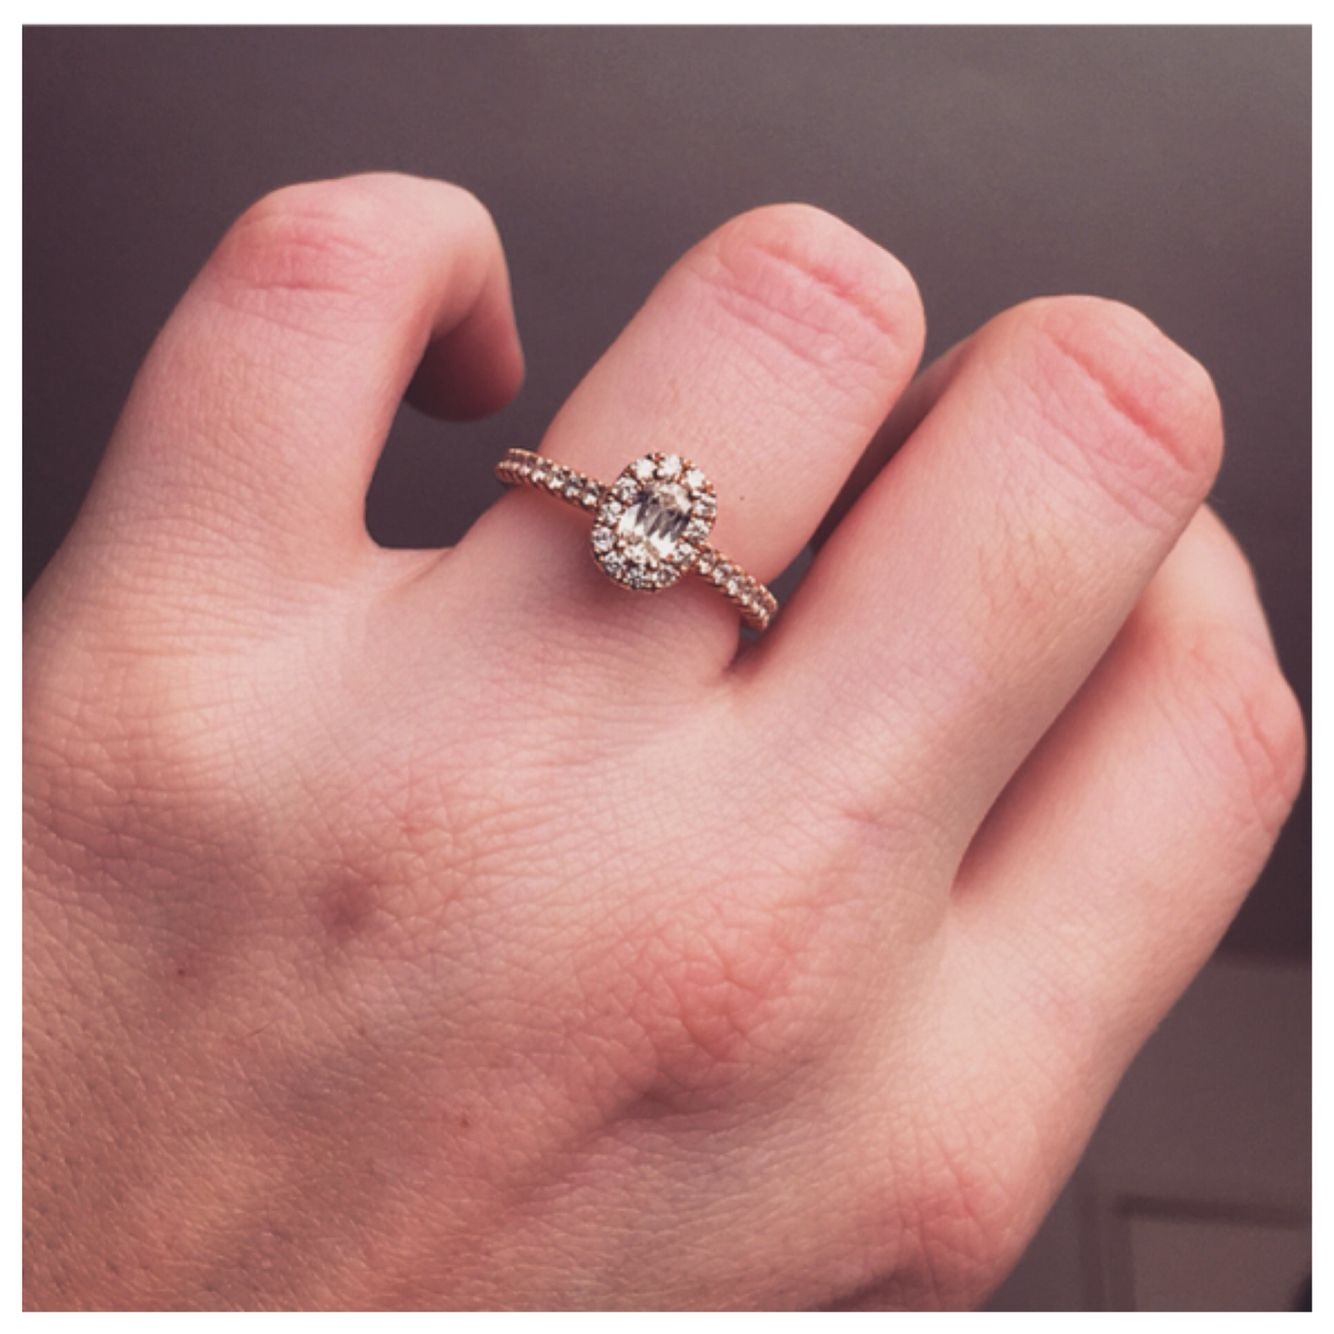 Aspiri Rose Gold Halo Cushion Cut Diamond Engagement Ring. 2/14/15<3 ...